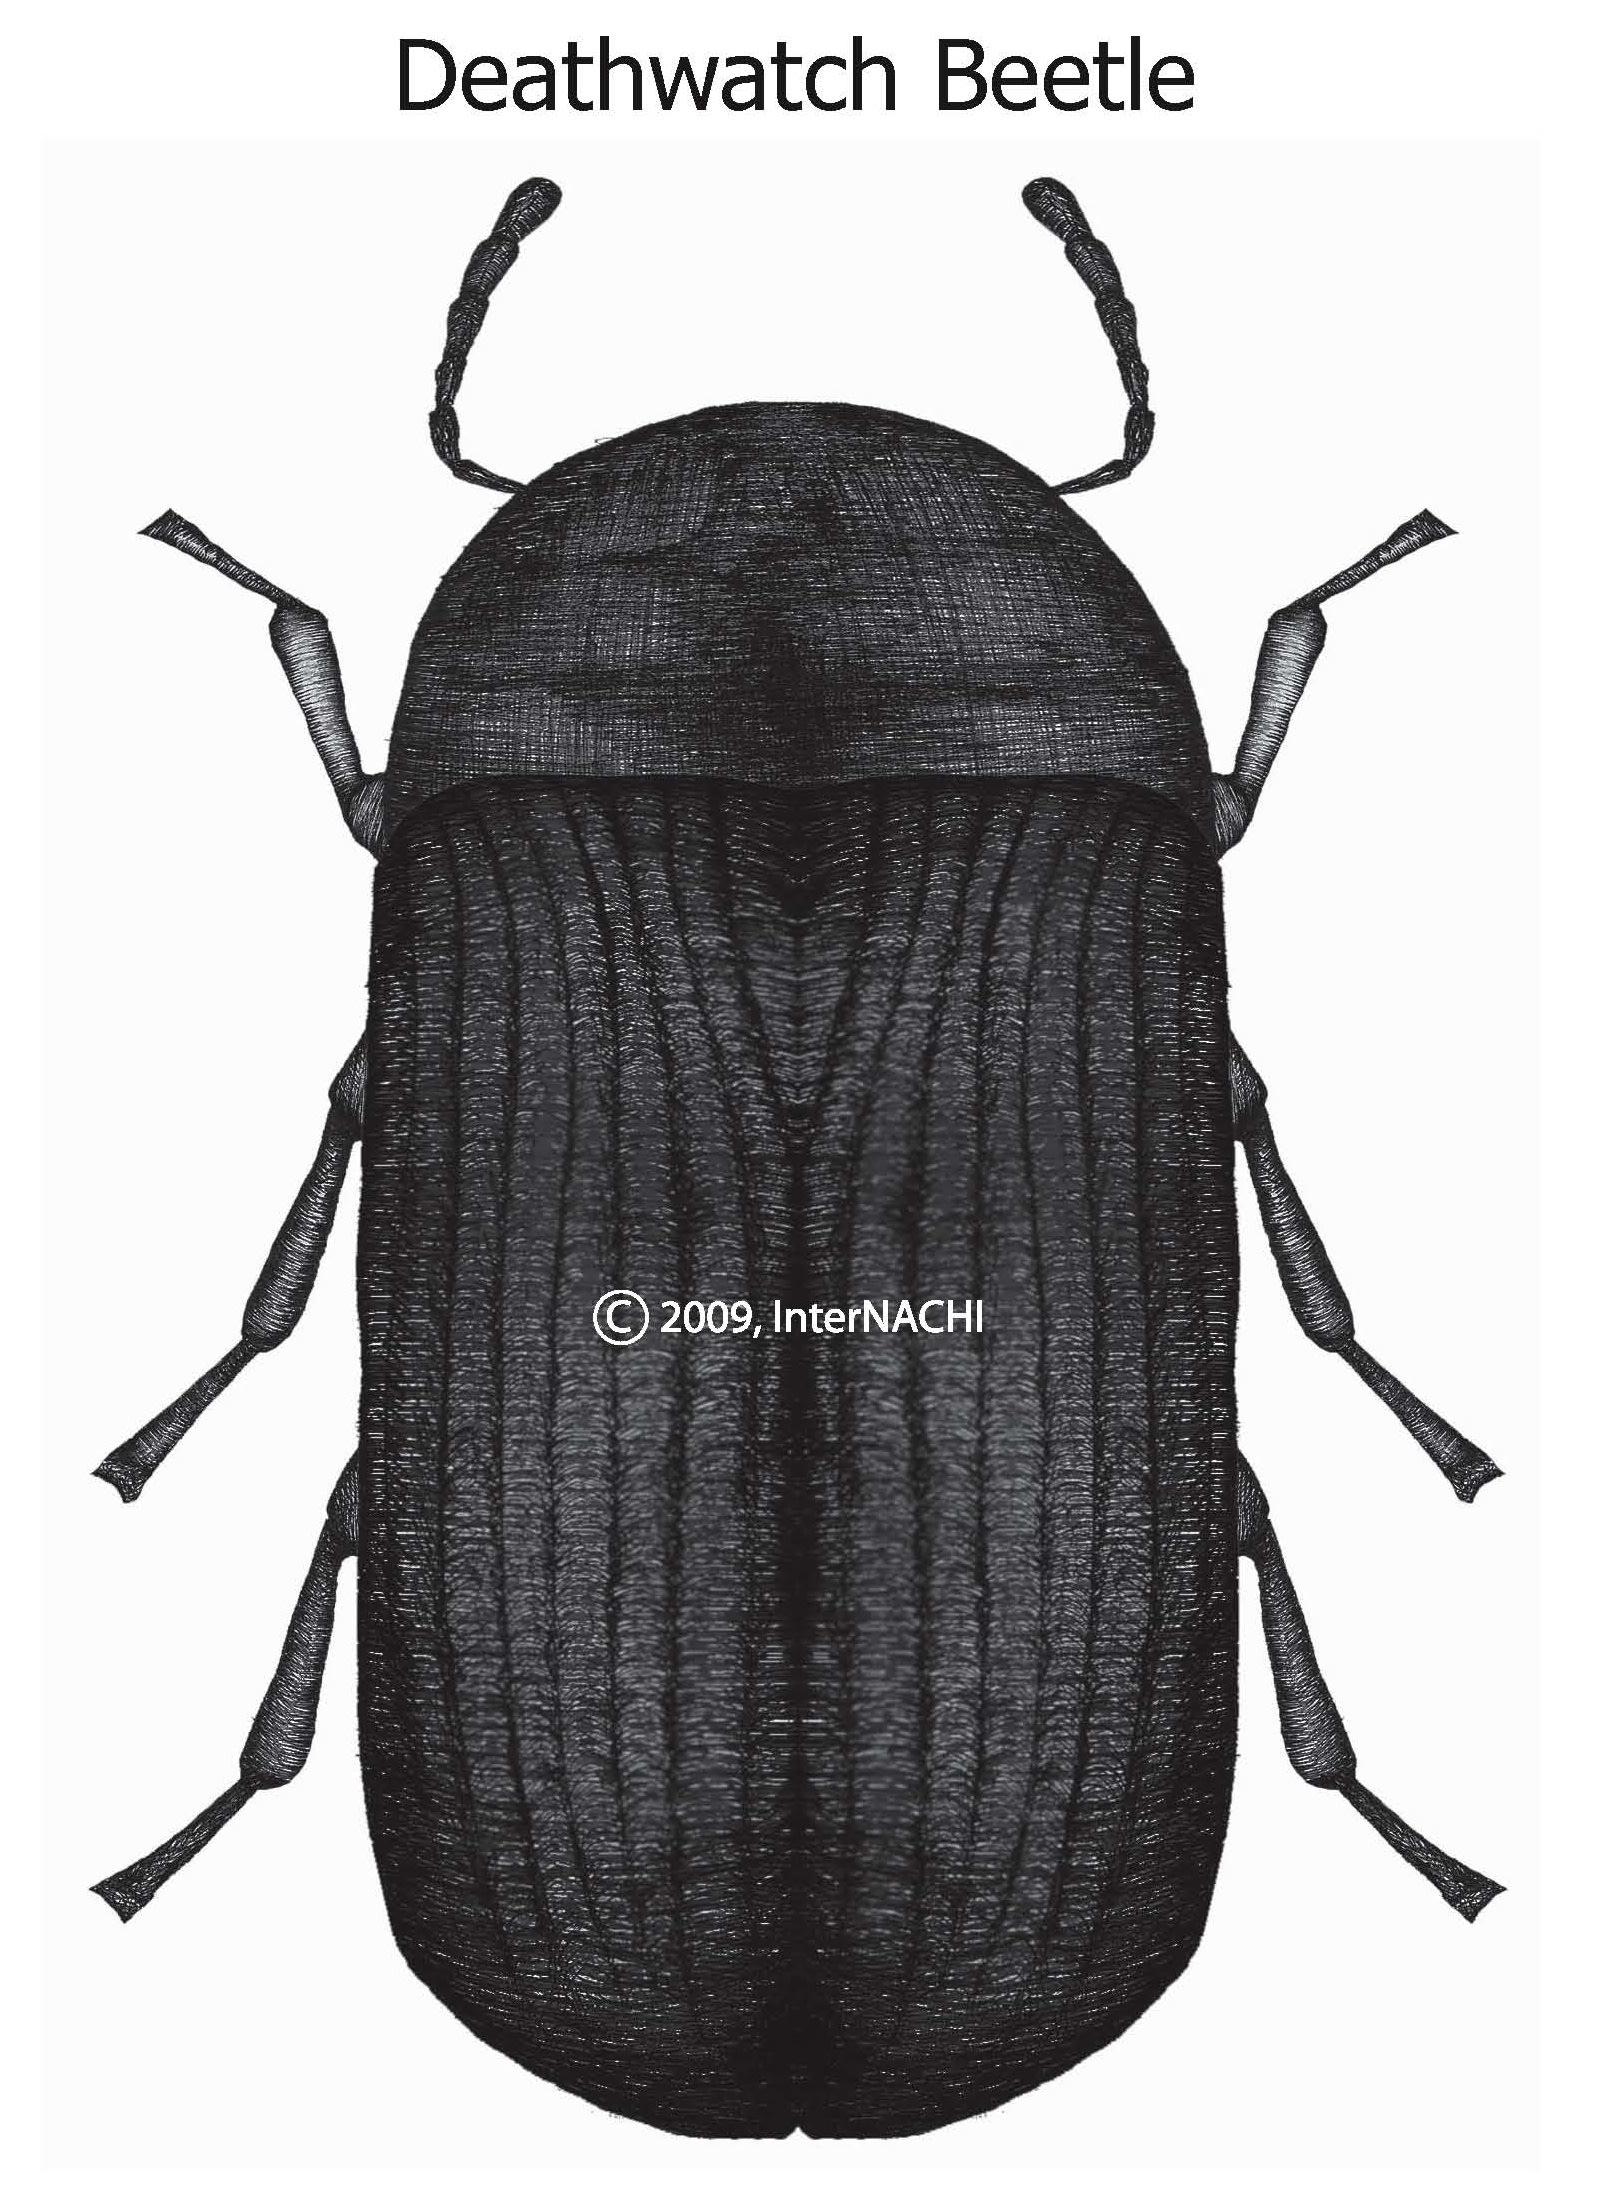 Deathwatch beetle.